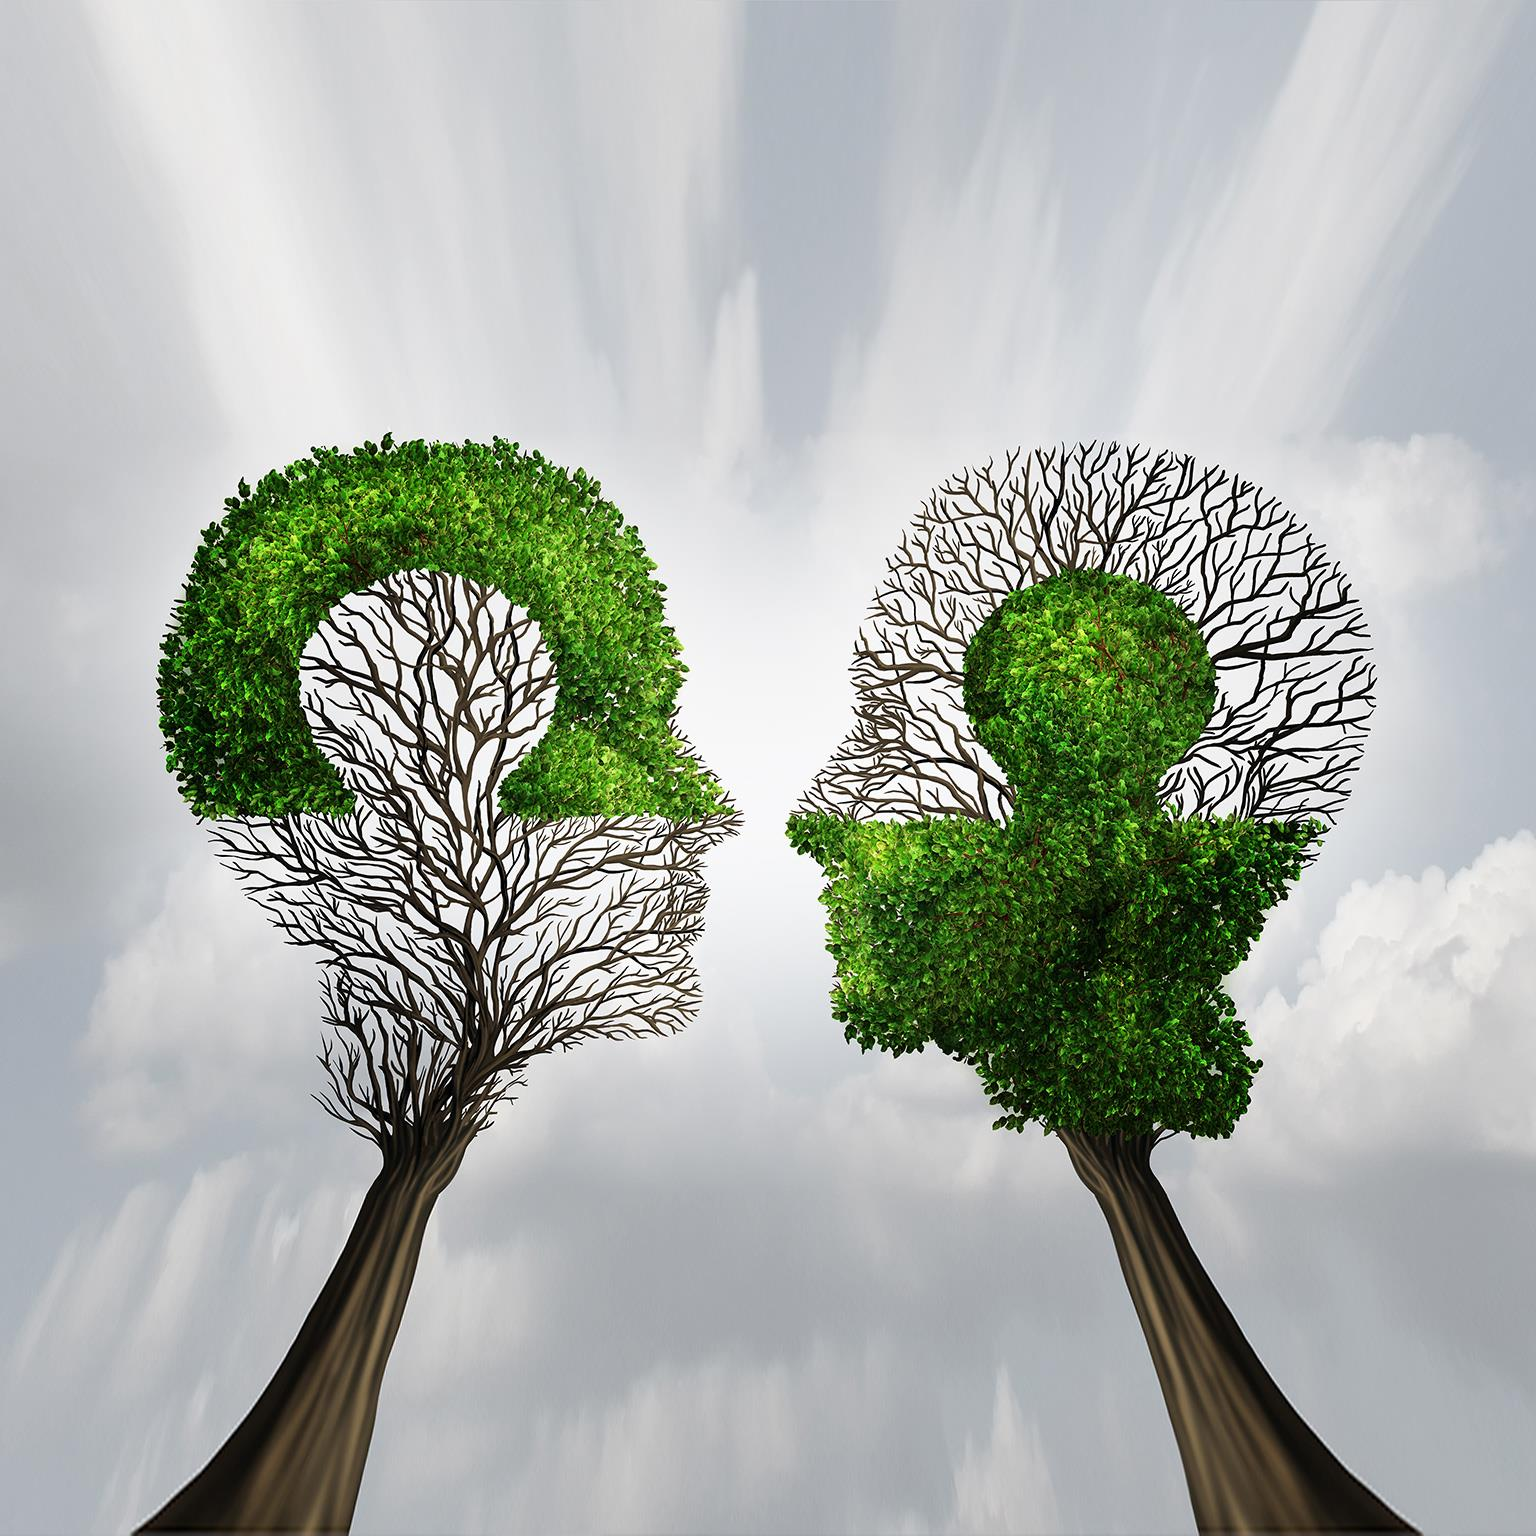 M a como alavanca para o crescimento como extrair todo o seu potencial comercial mckinsey - Successful flower growing business ...